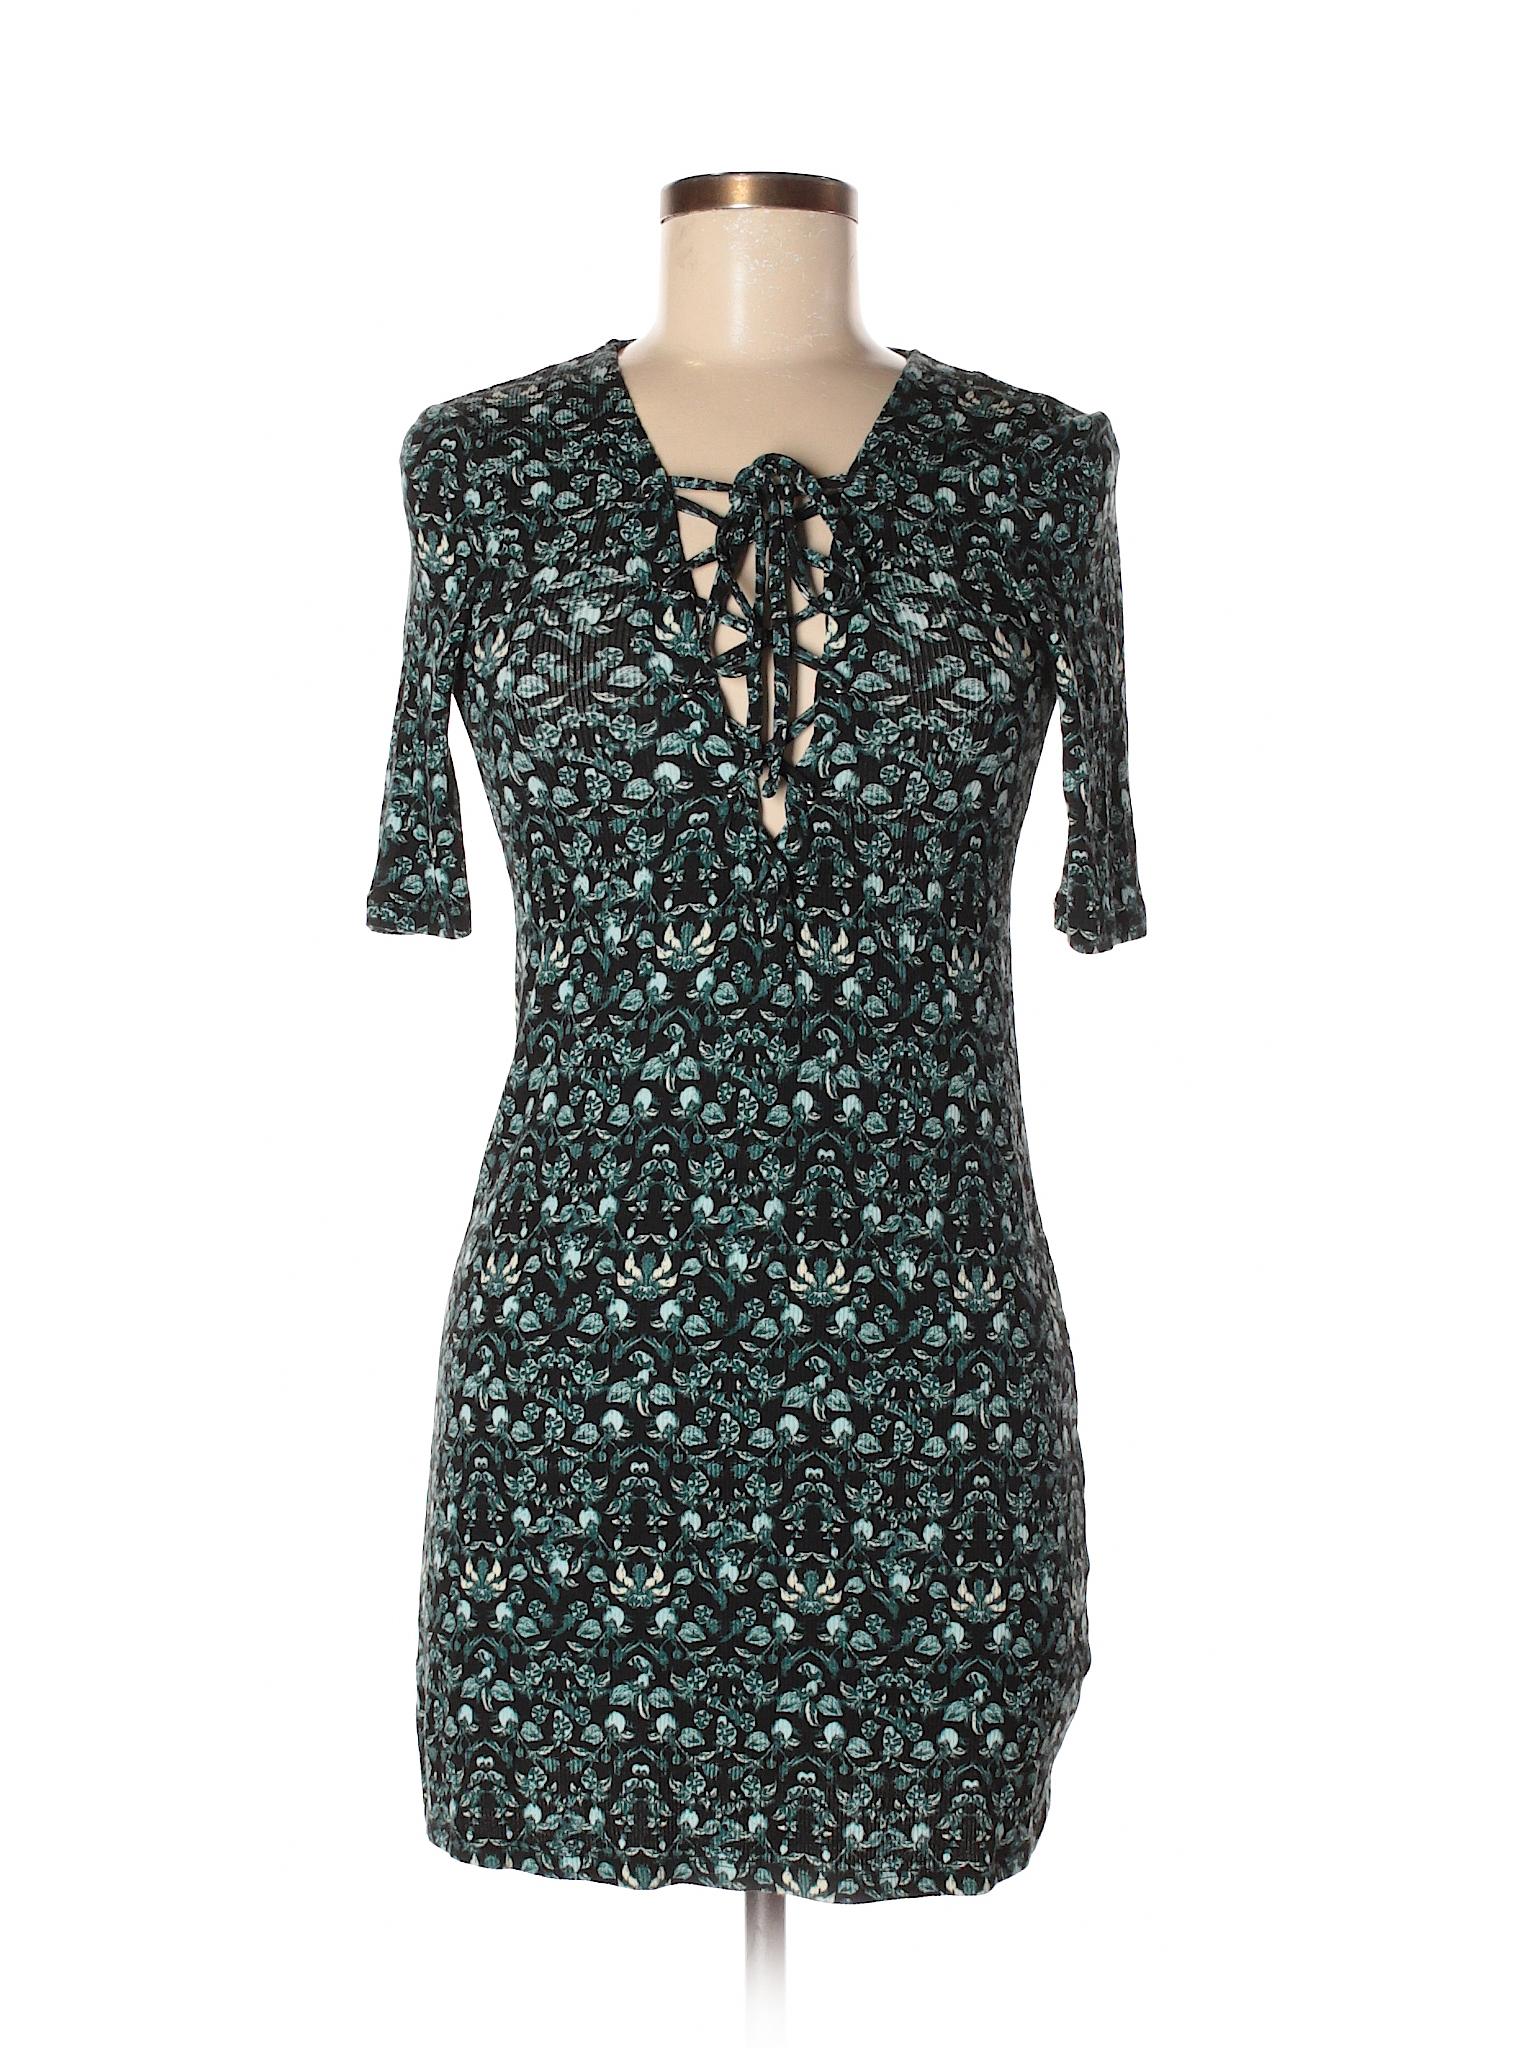 Dress Topshop Boutique Casual winter winter Boutique Casual Topshop X06vqwzW8